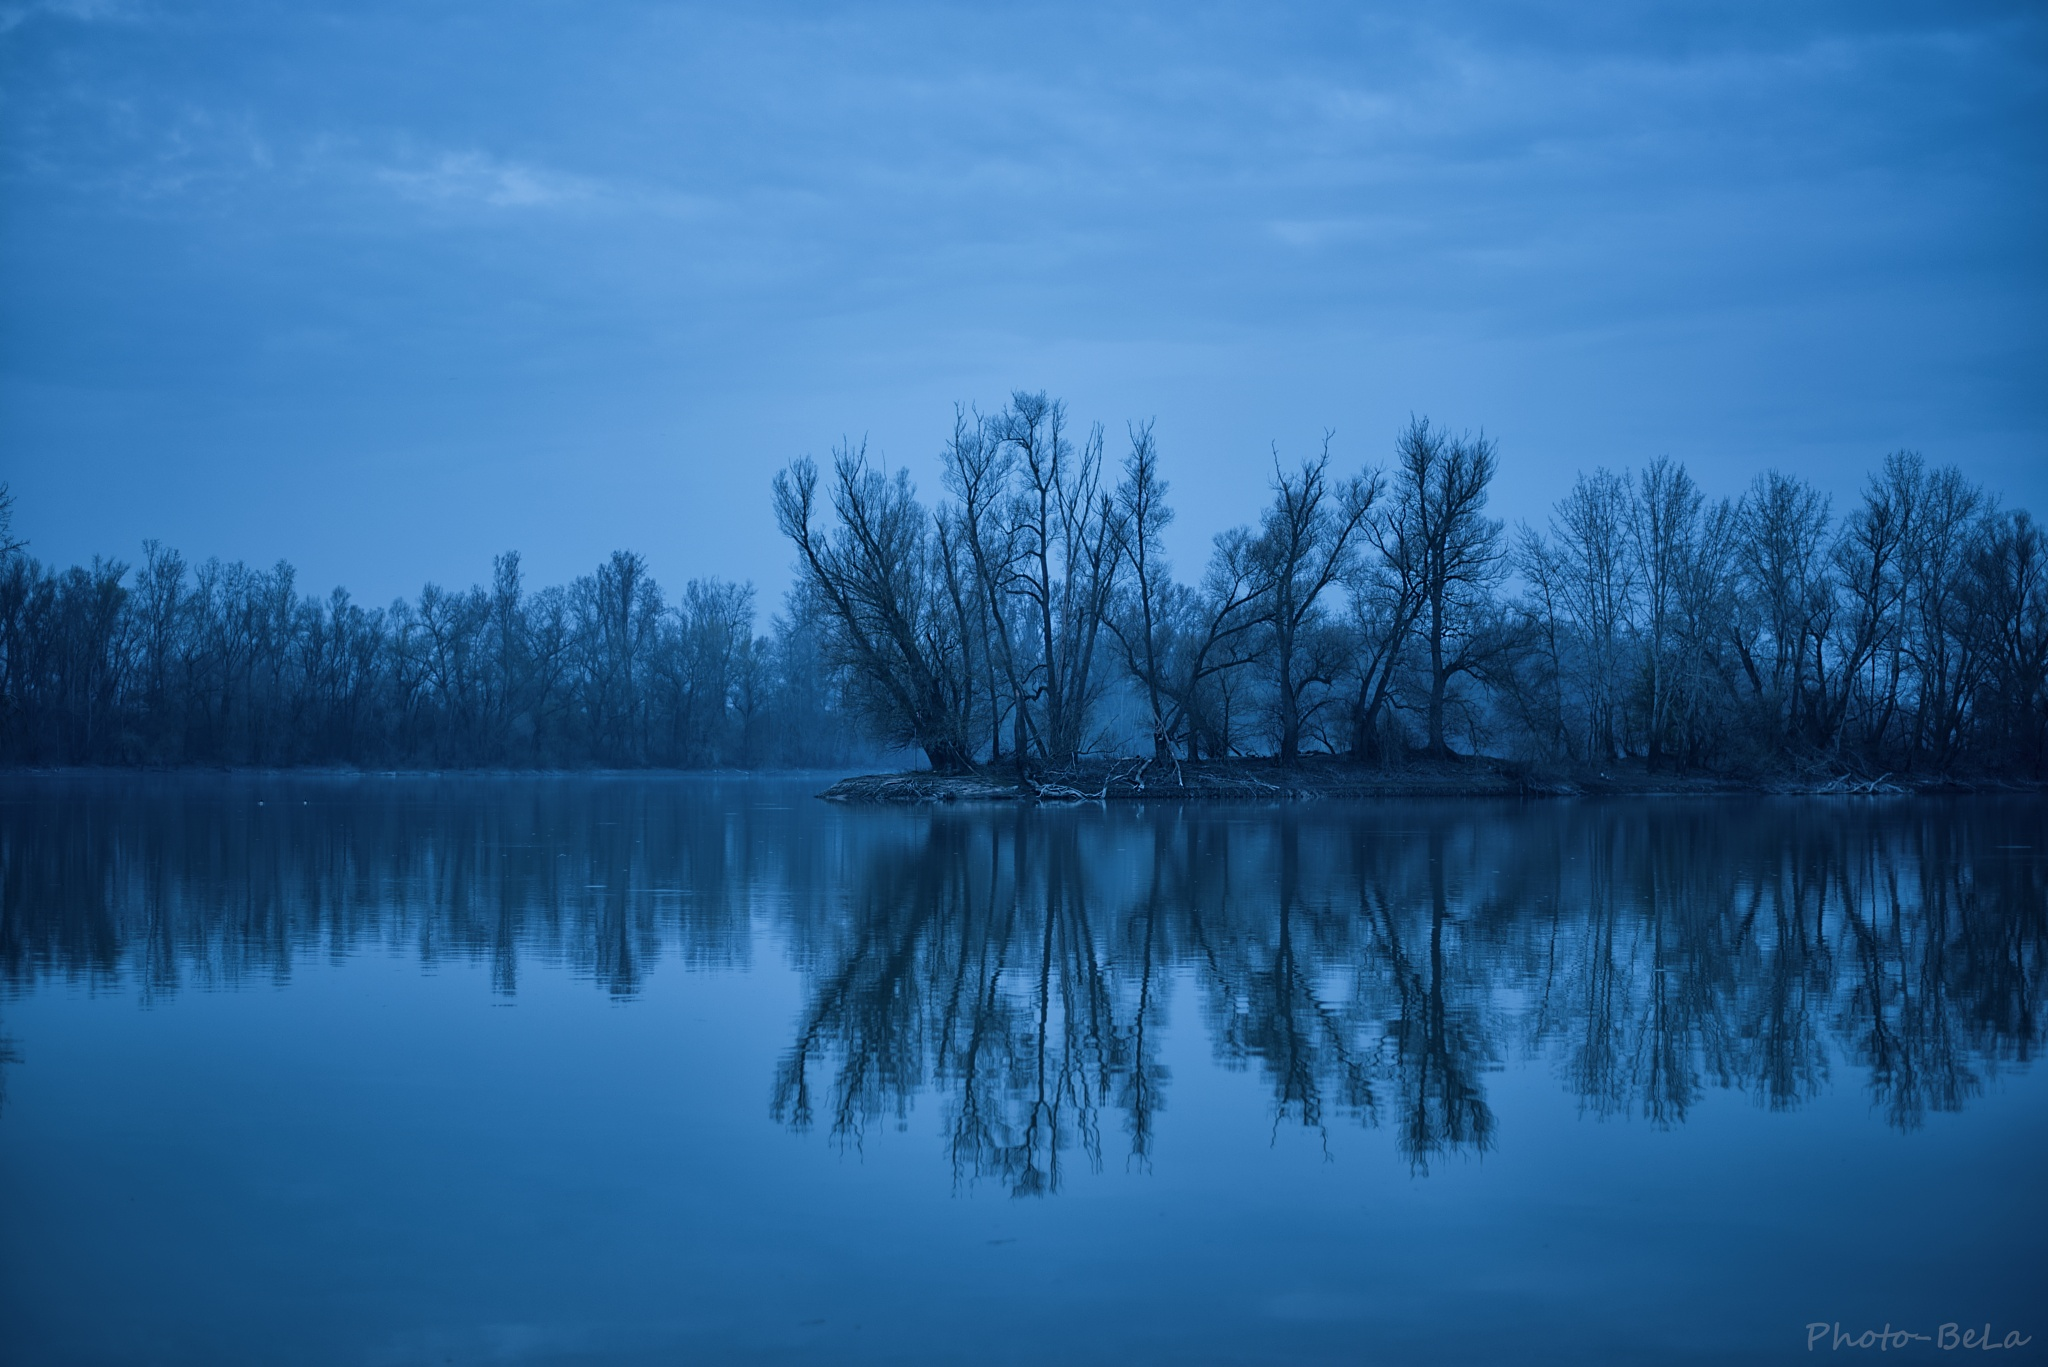 Blue hour by Bernie Lamberz photography